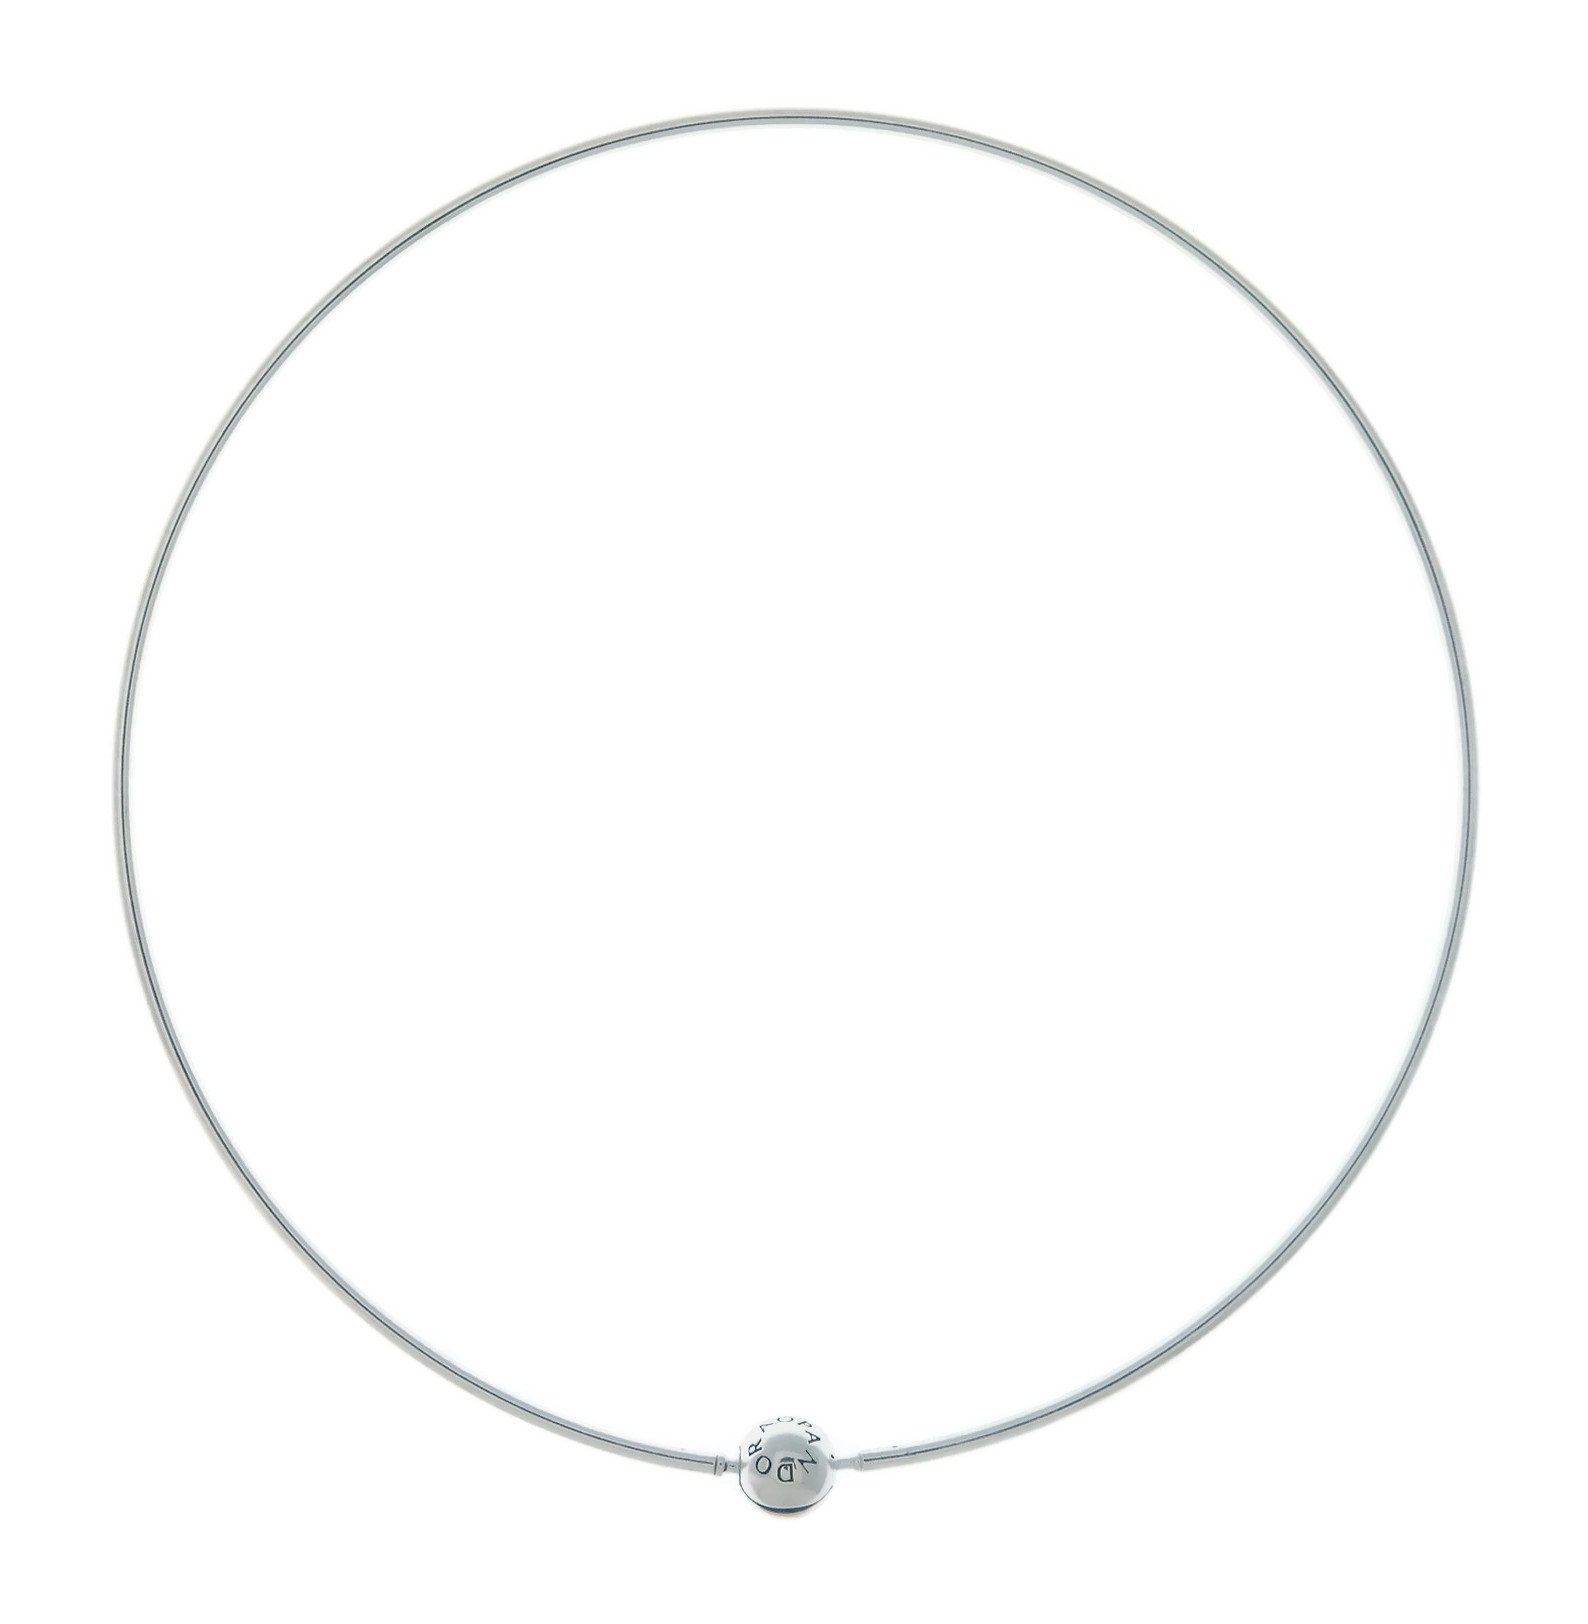 PANDORA-Essence-Silver-Necklace-397296-40